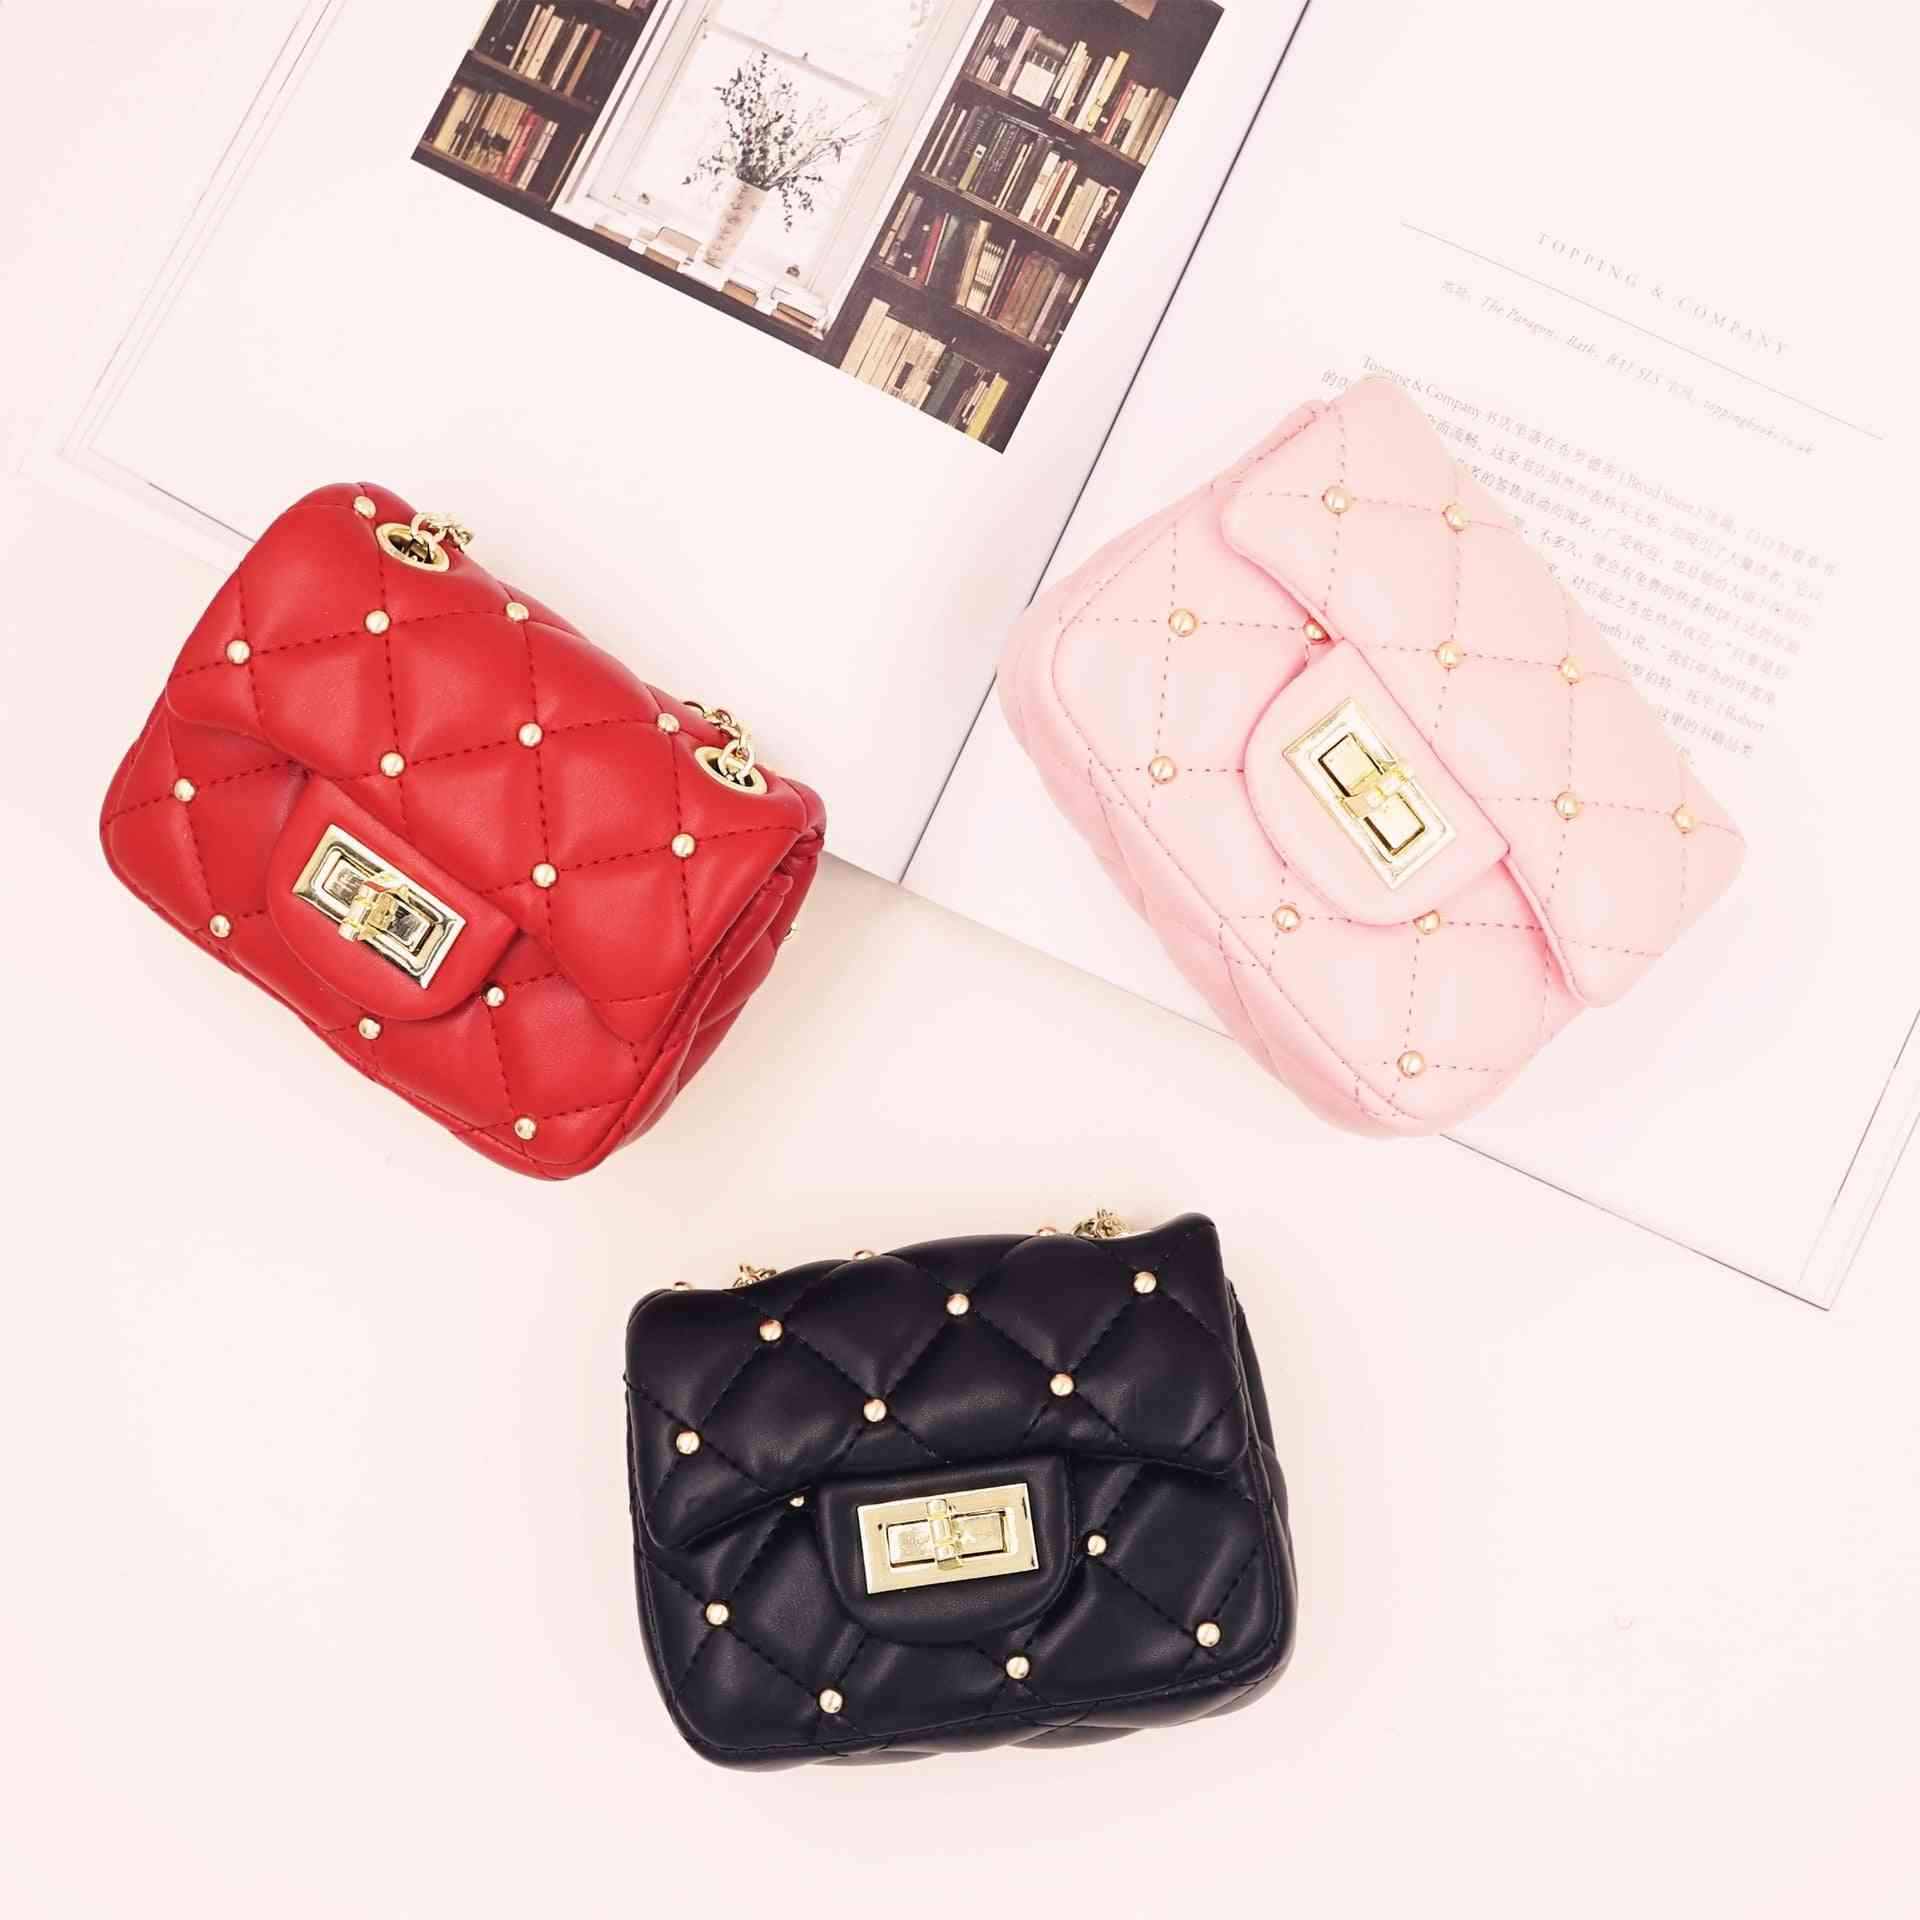 Mini Cute Pu Leather, Rivet Bags With Chain